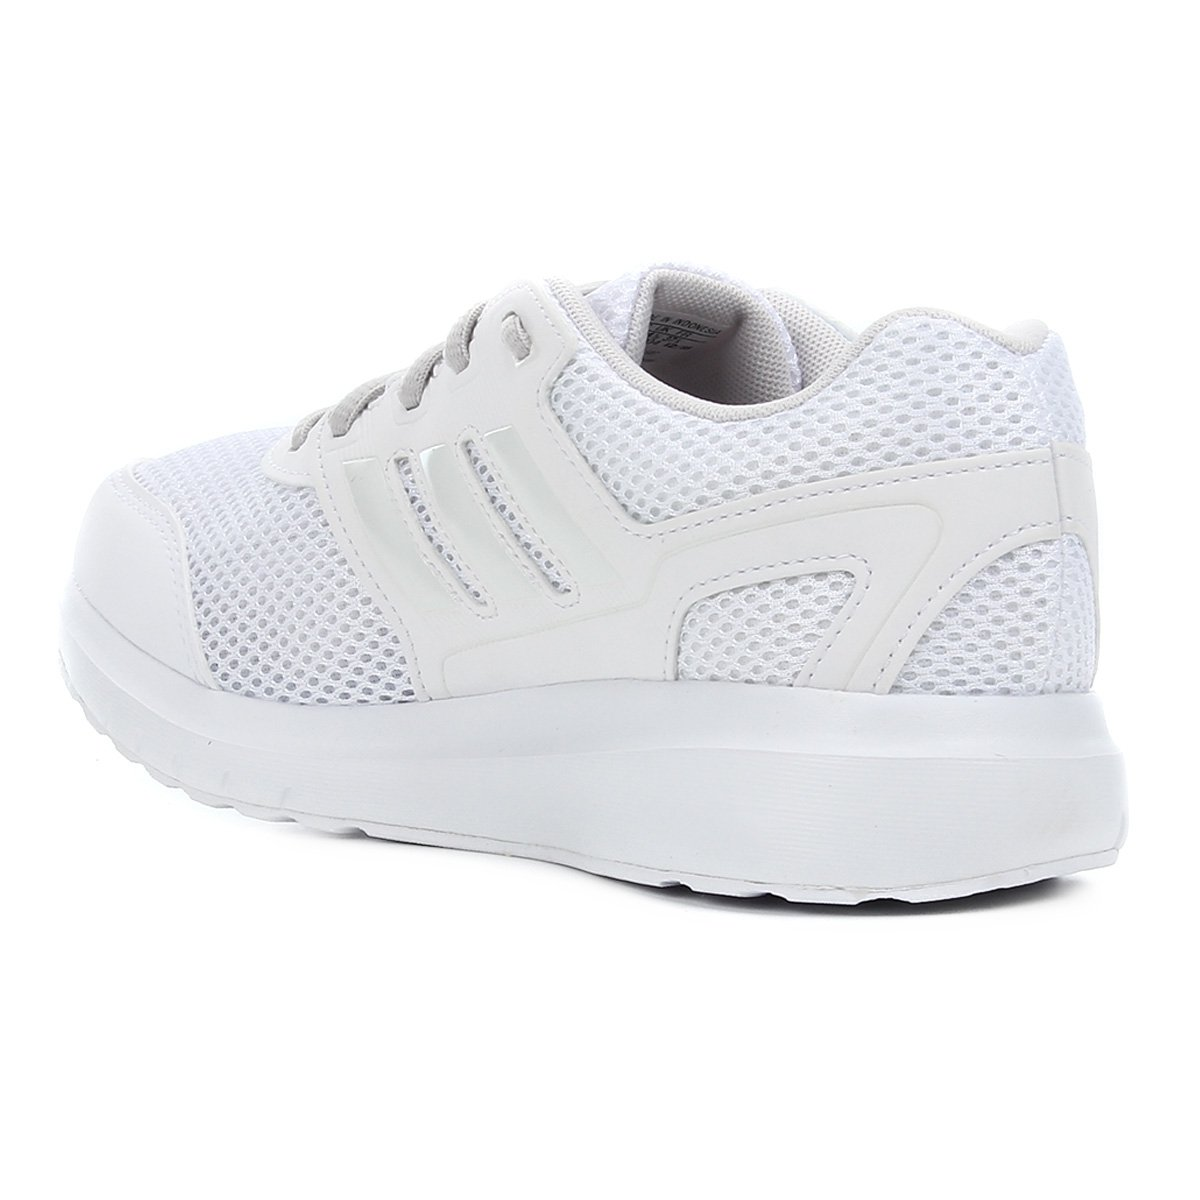 dcac712f60 Tênis Adidas Duramo Lite 2 0 Feminino | Opte+